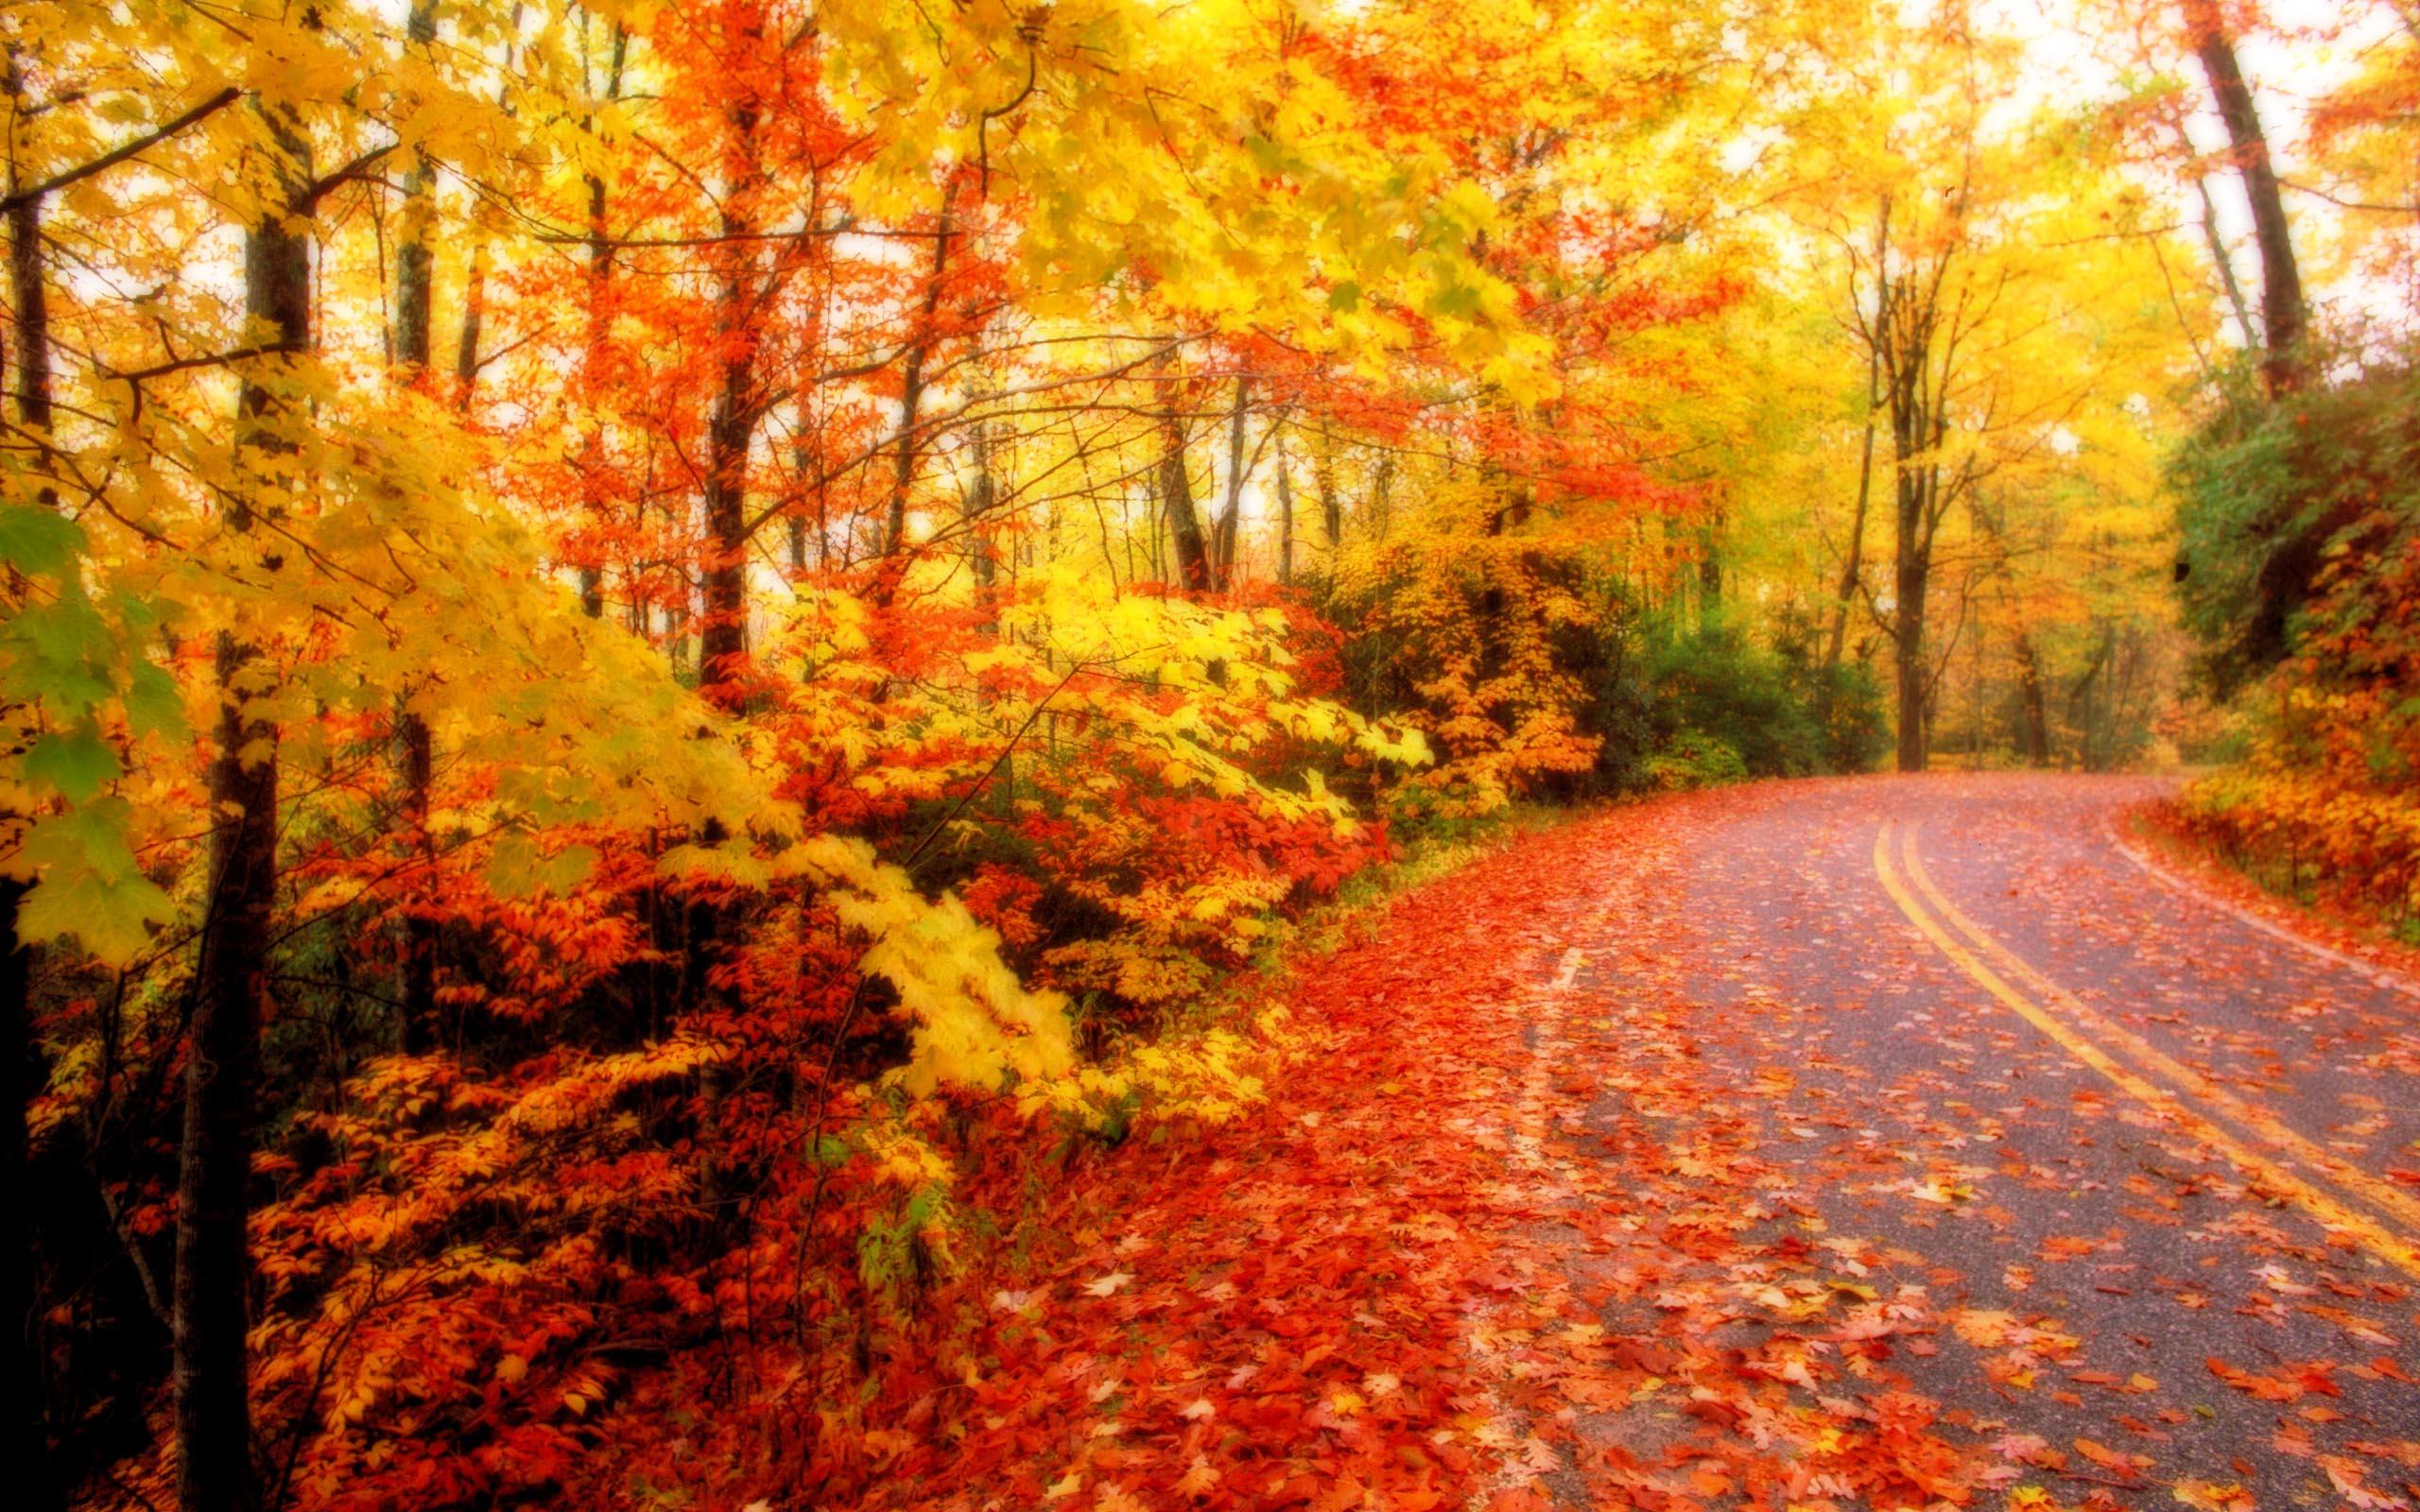 Great minds discuss ideas latest autumn season wallpapers 2013 2014 2560x1600